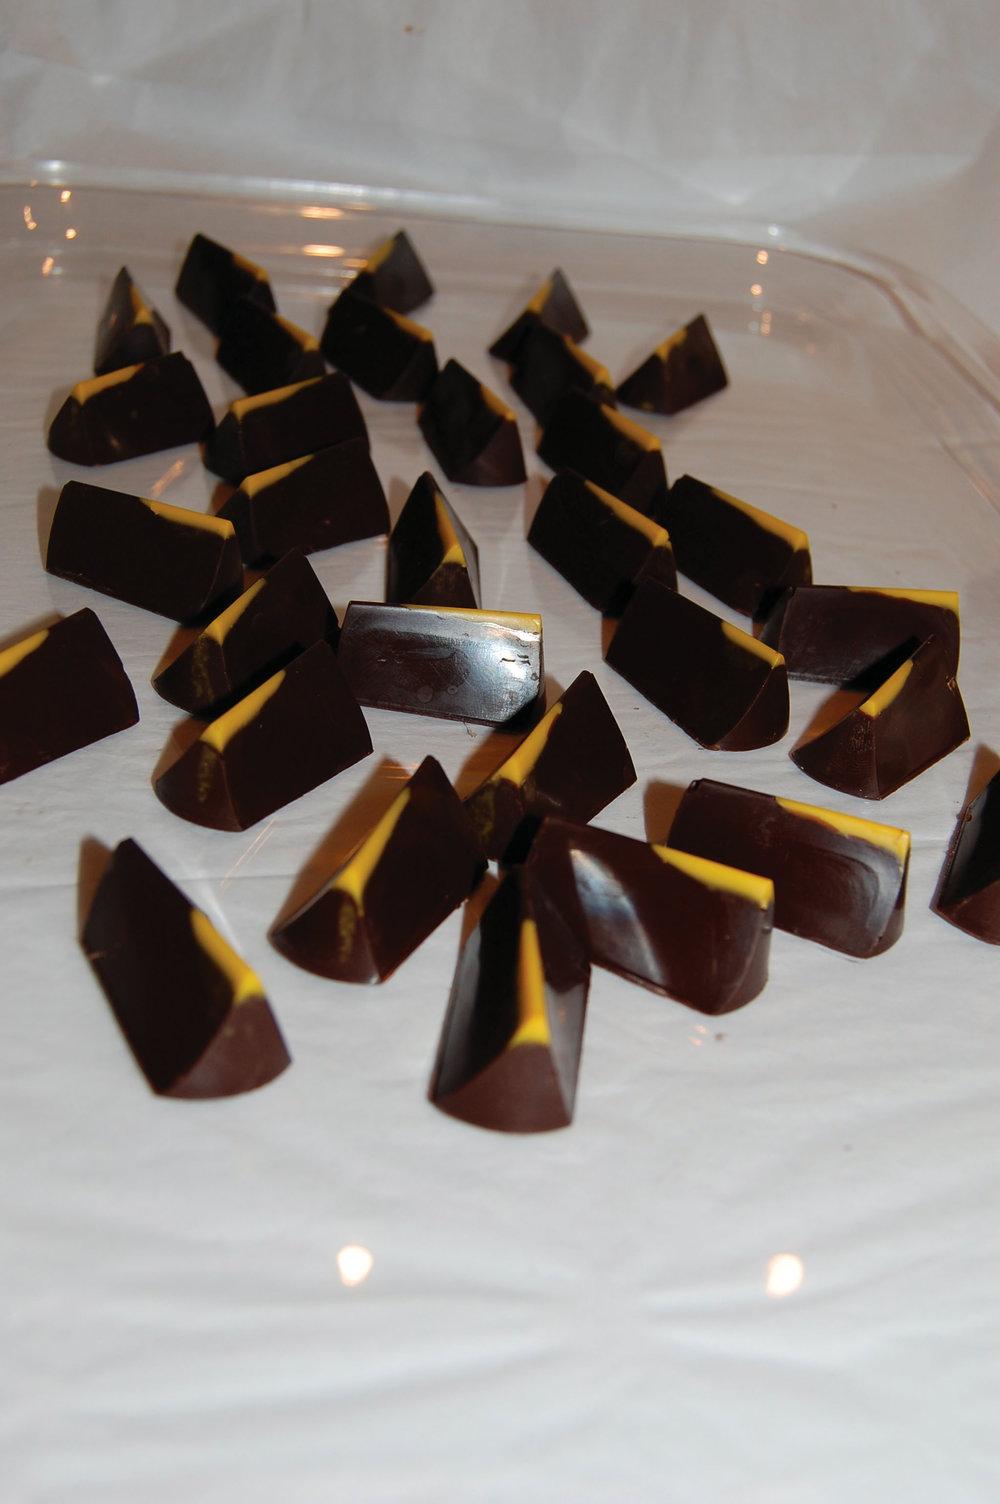 Koko Monk's extraordinary bars and bonbons showcase the best of minimally processed cocoa beans. Photos courtesy of Koko Monk Chocolates